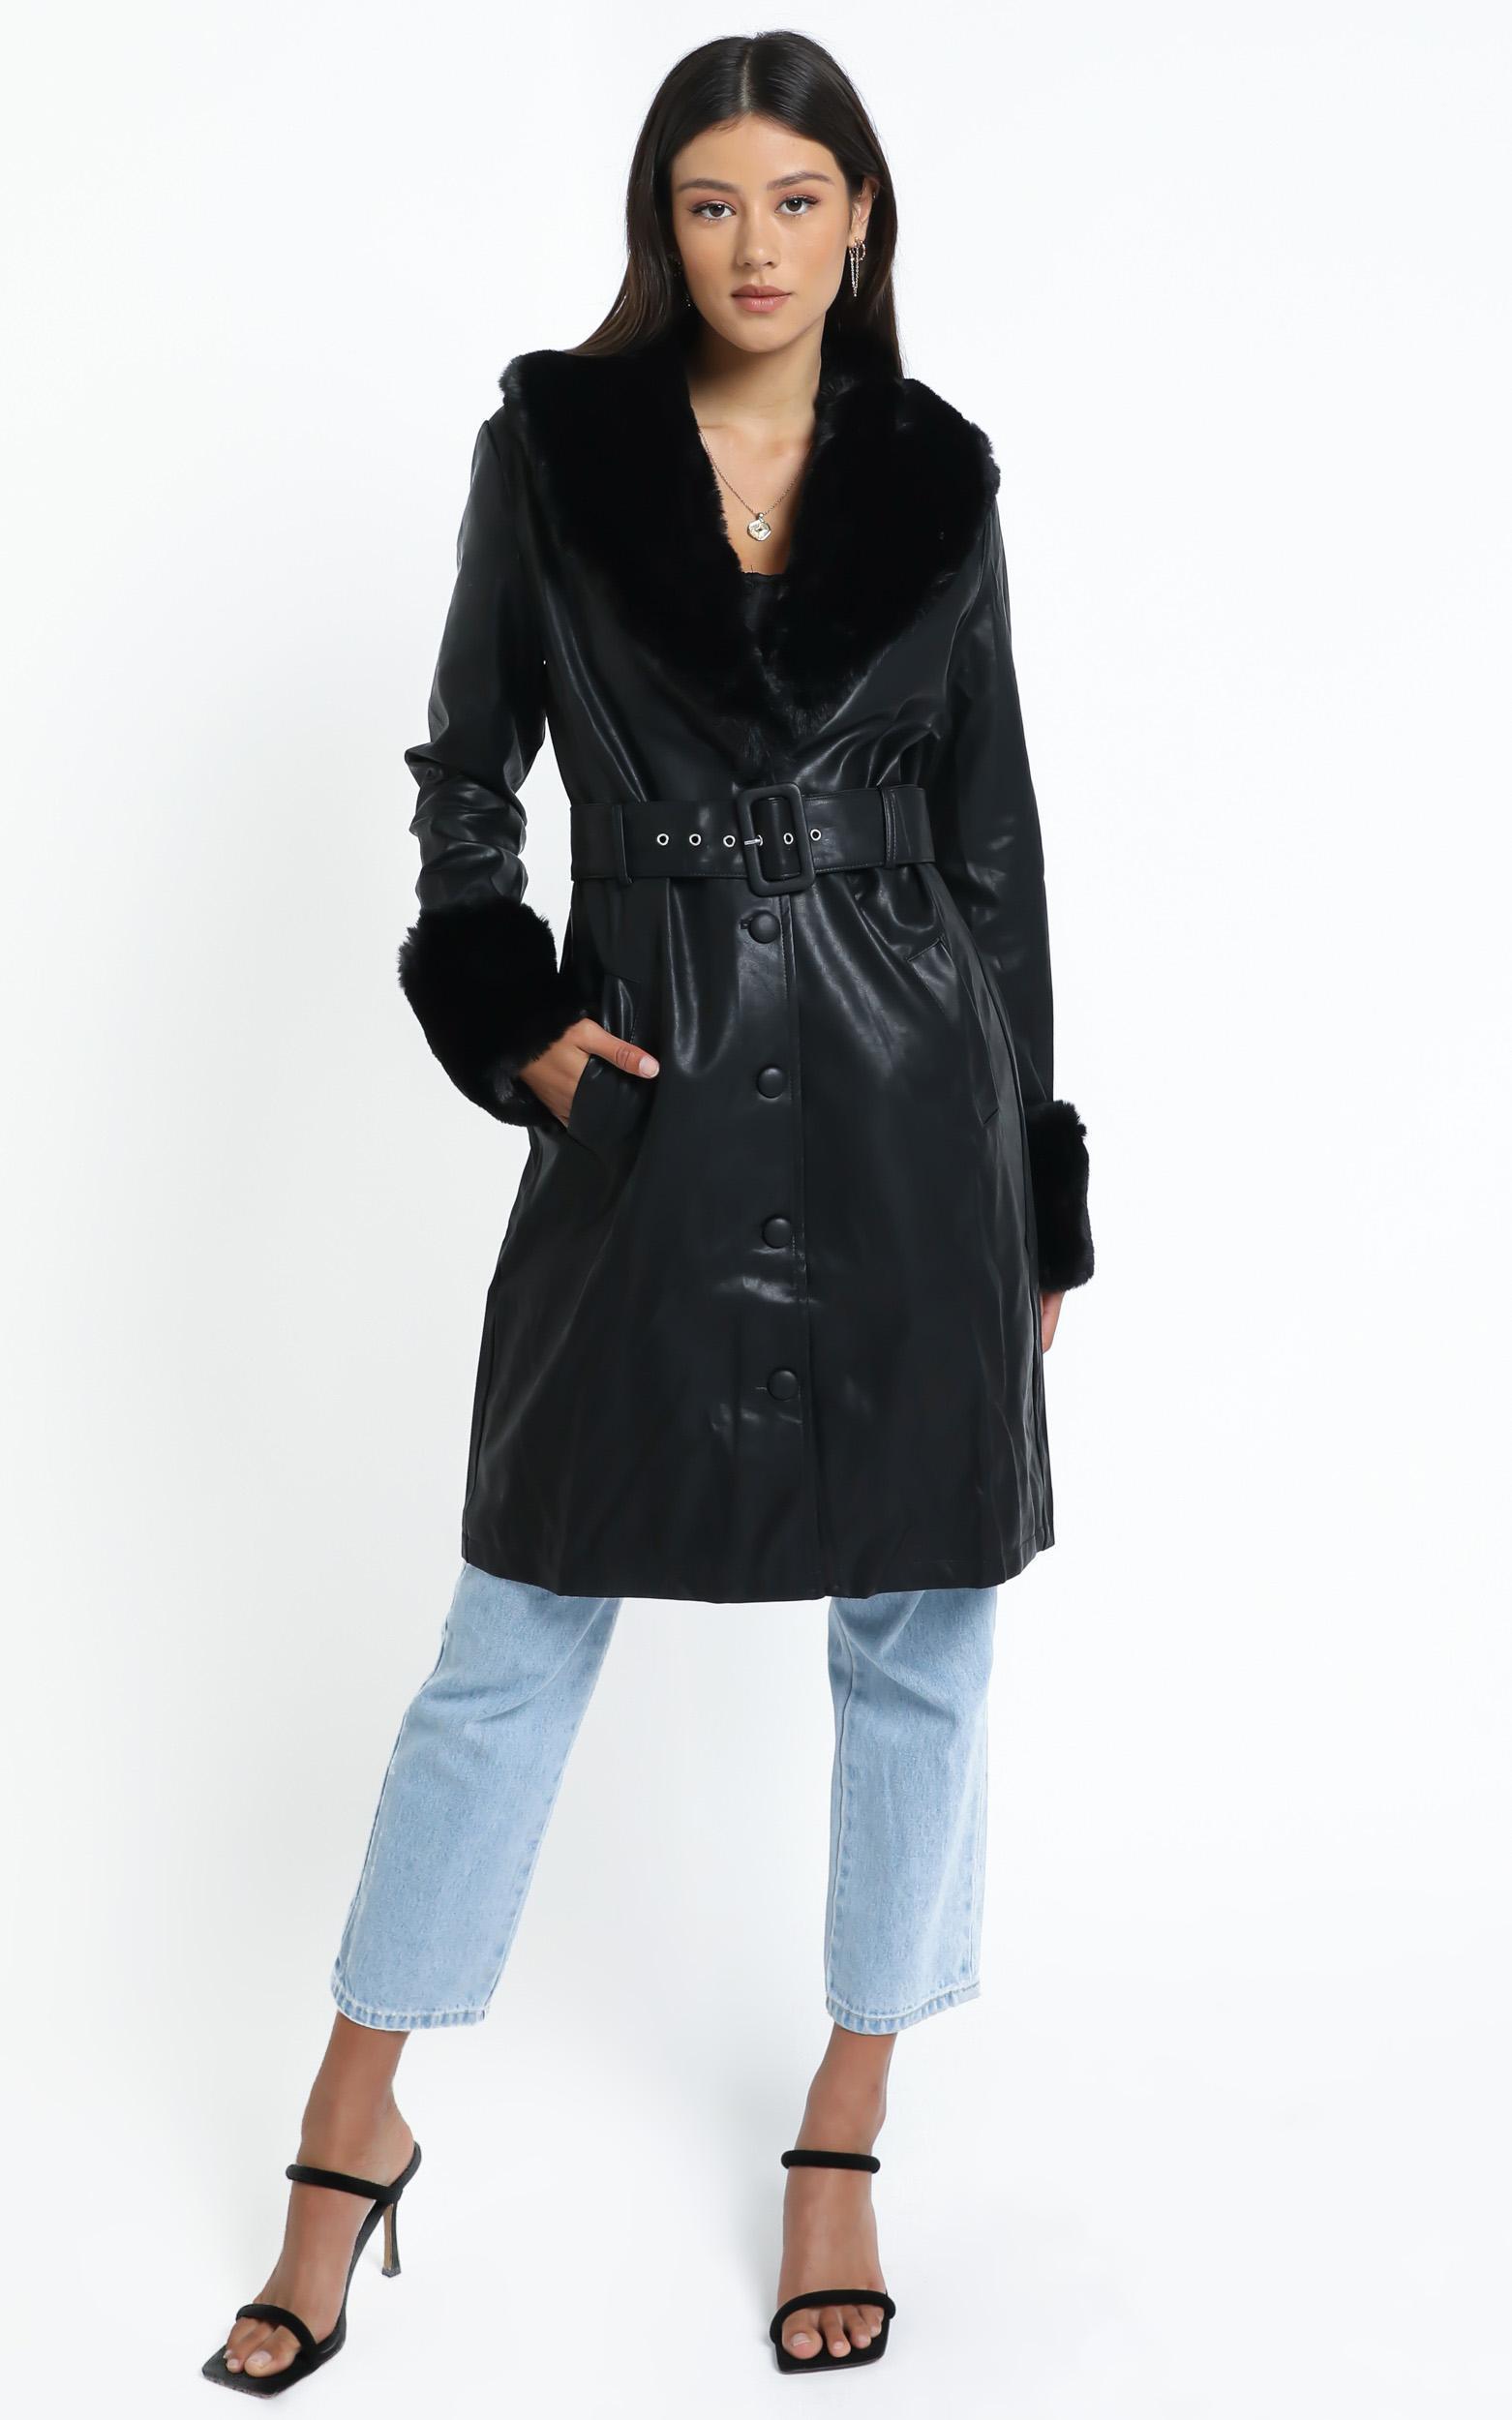 Brooklyn Long Coat in Black - 12 (L), Black, hi-res image number null